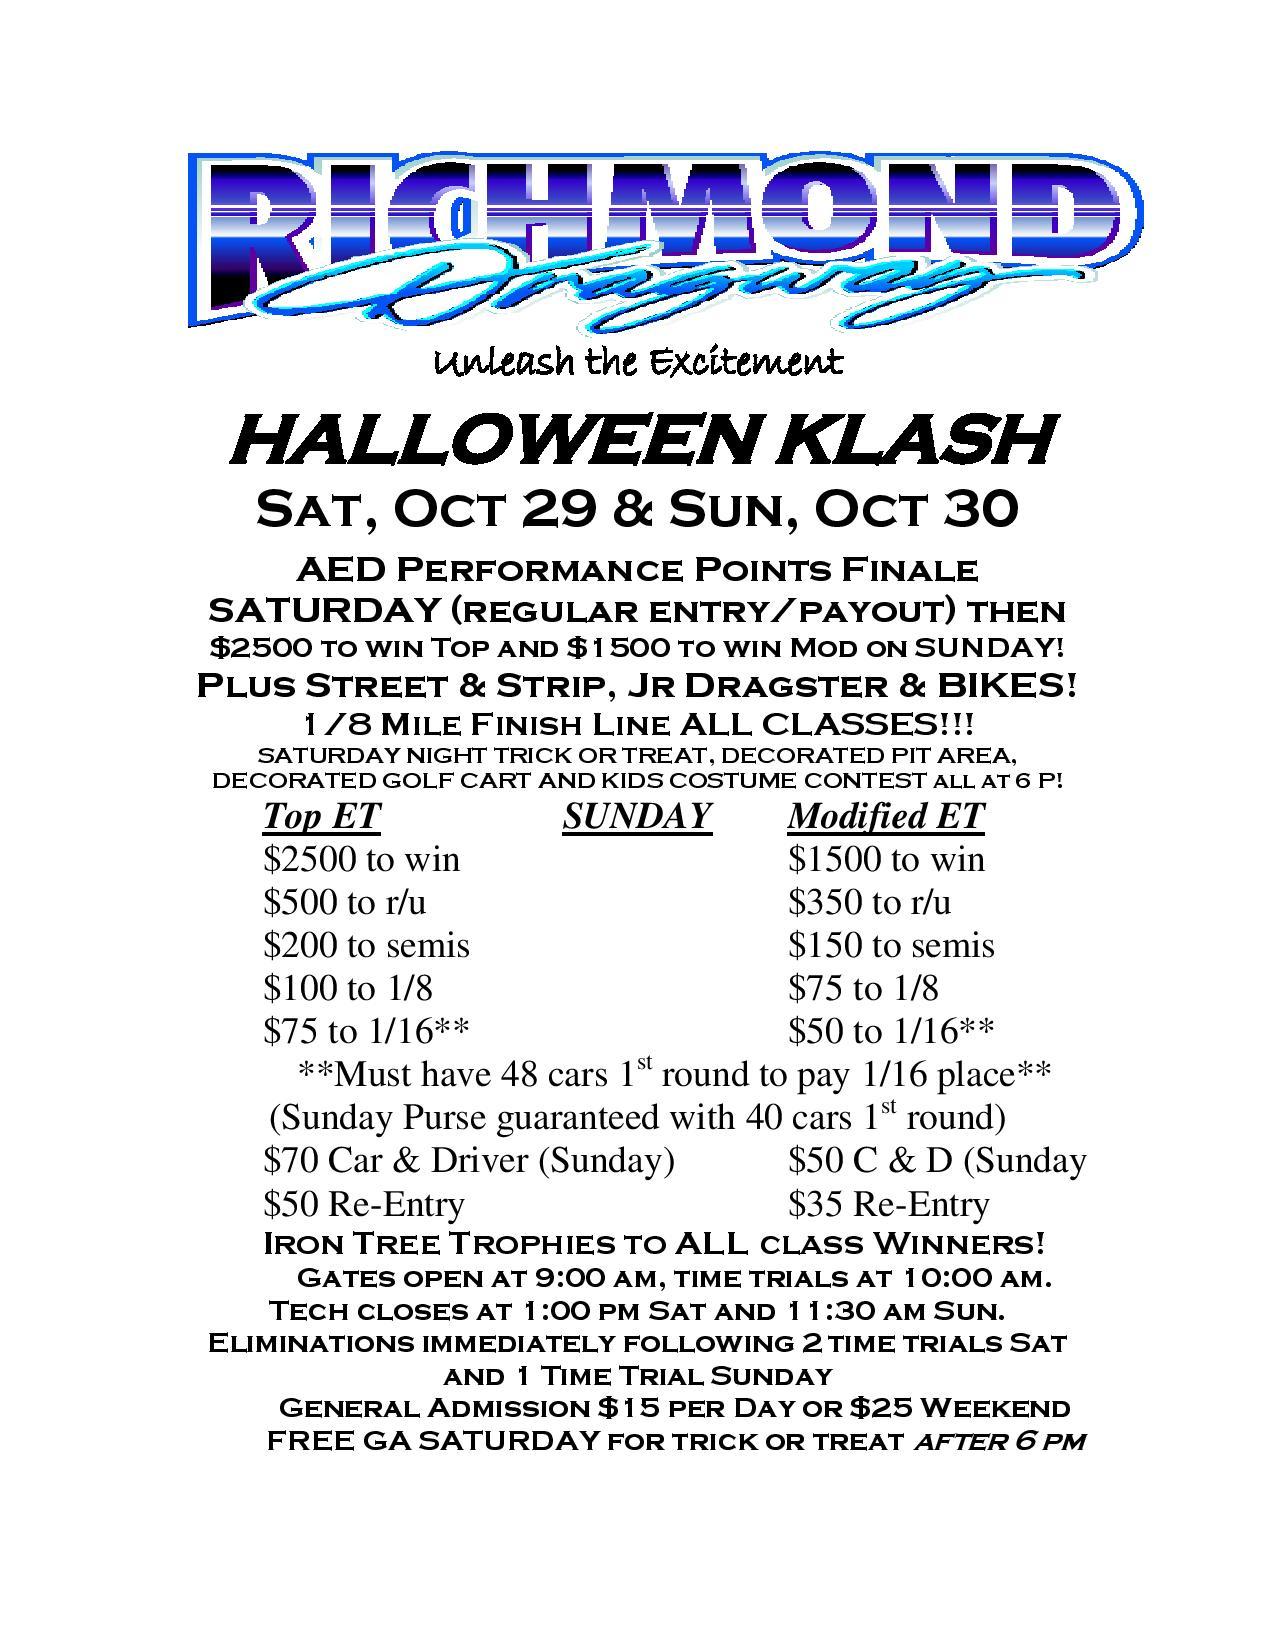 THIS WEEK: FINAL Vaperz Advantage Friday Nite Street Fights/TNT This Friday-Halloween Klash on Saturday and Sunday thumbnail